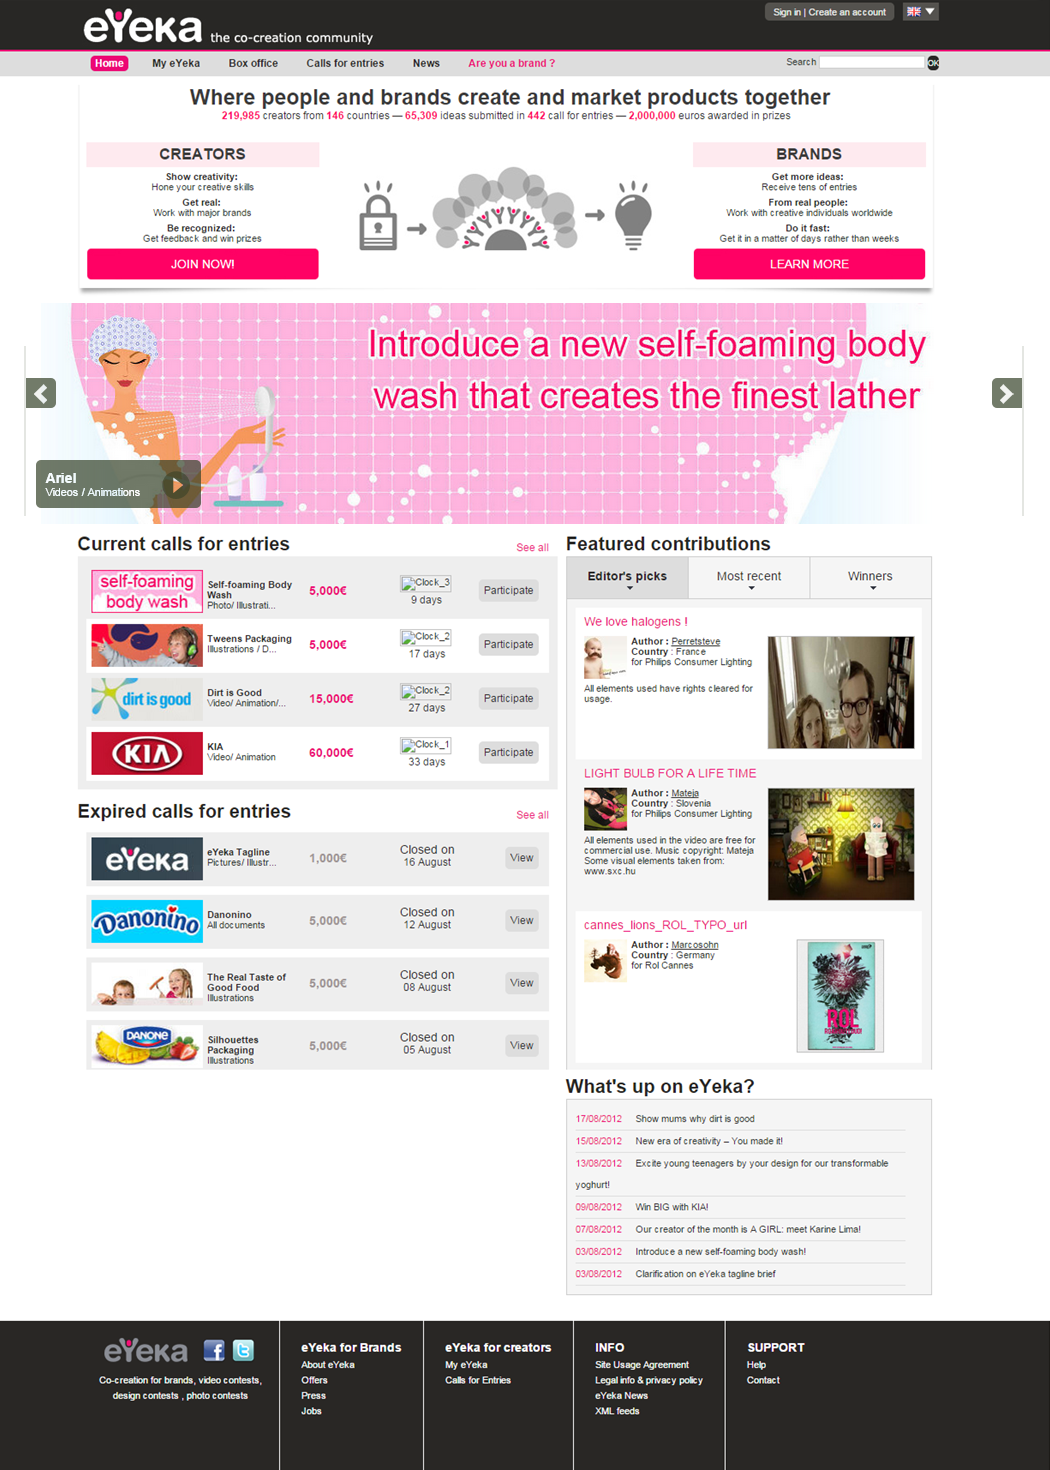 August 2012 - Web Archive